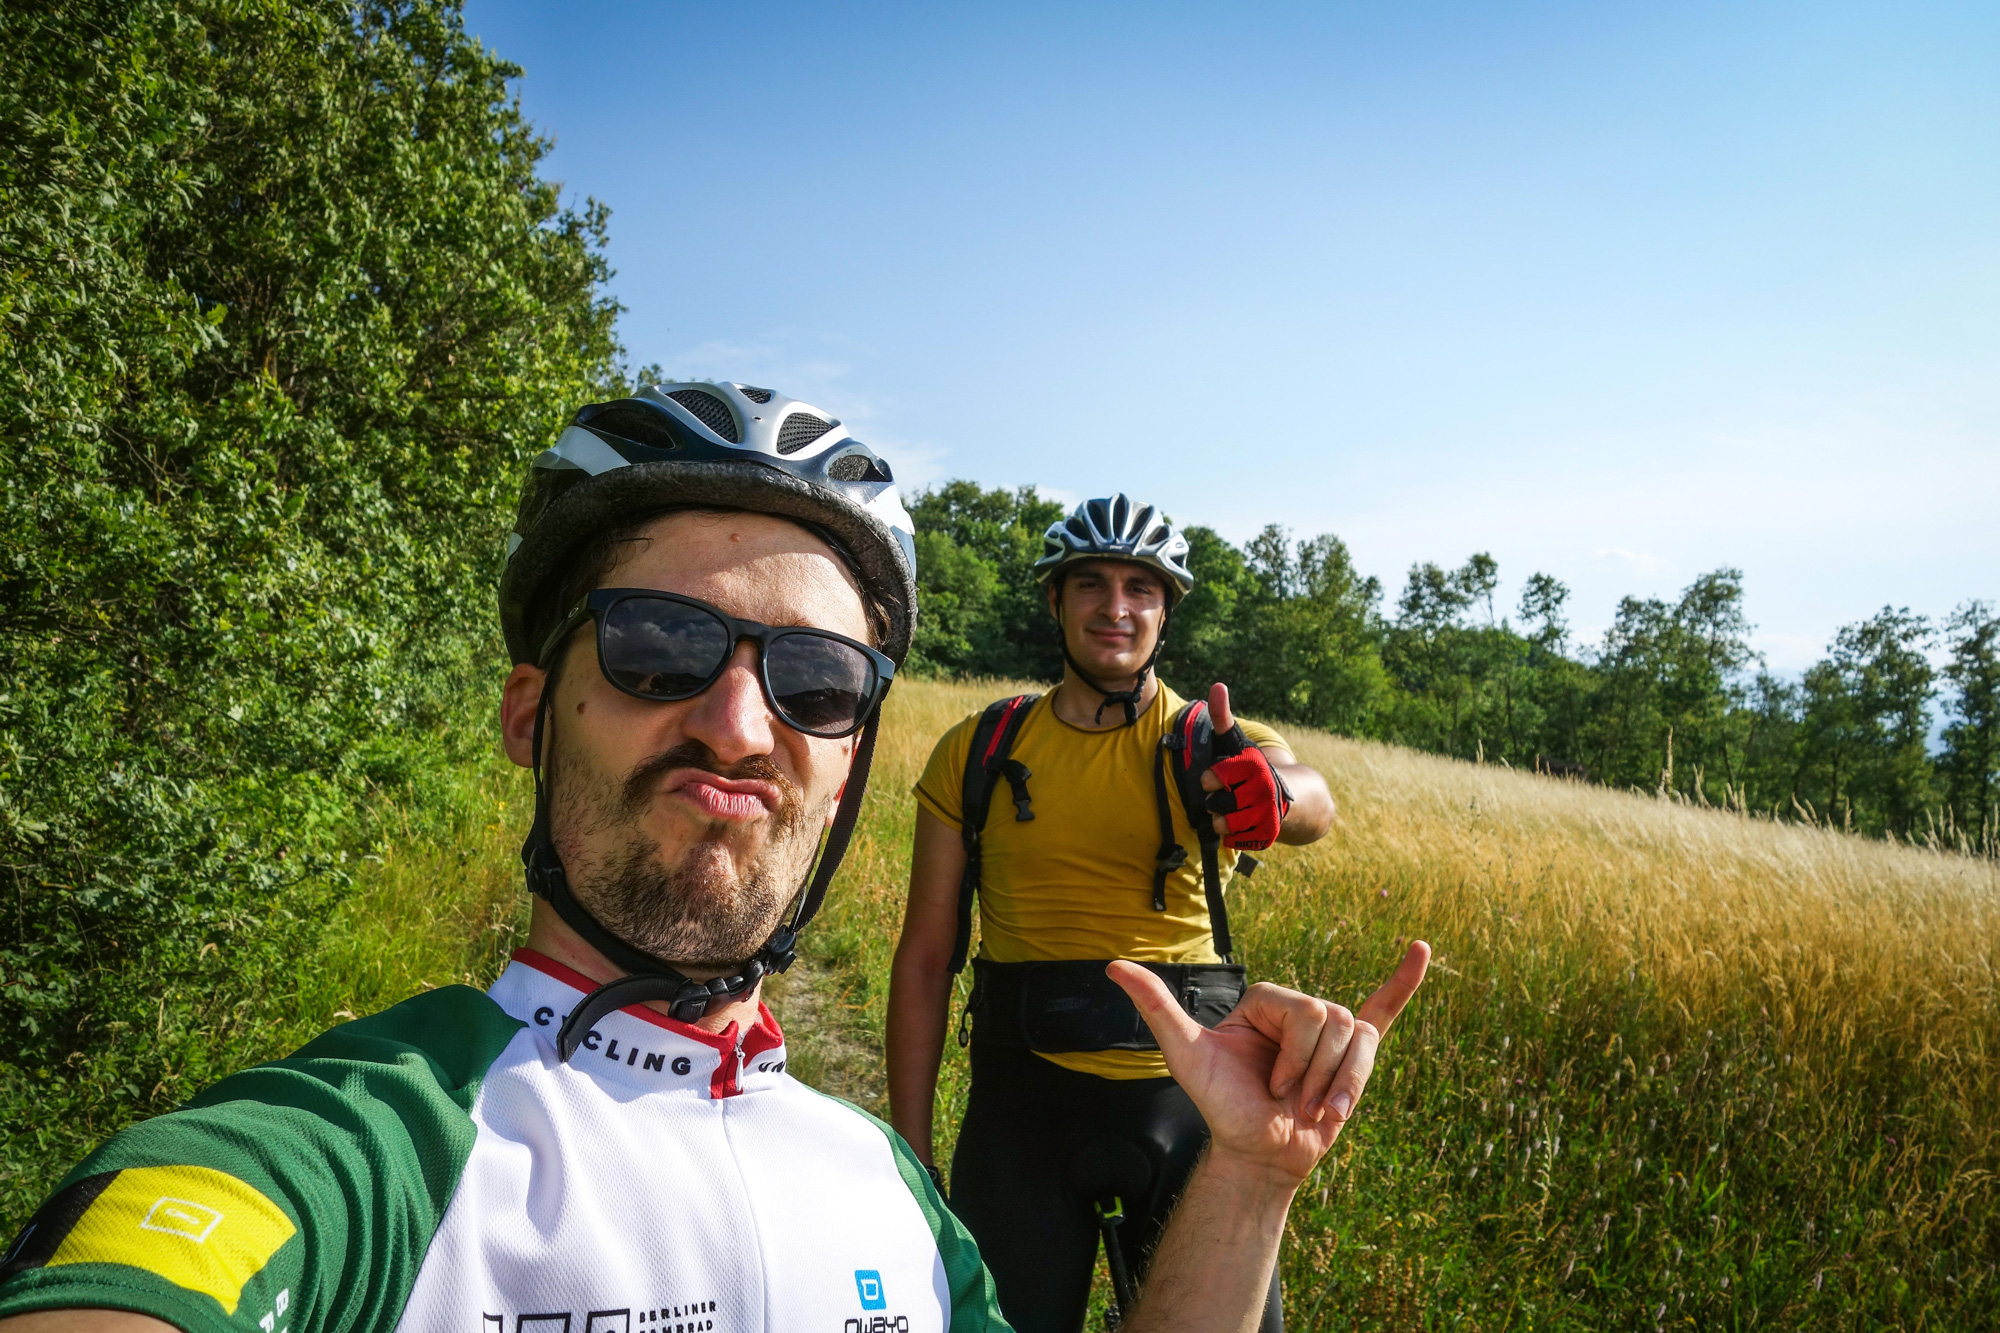 zocca_mtb_ride_appennino_modenese_erman_bike_dimondi-9